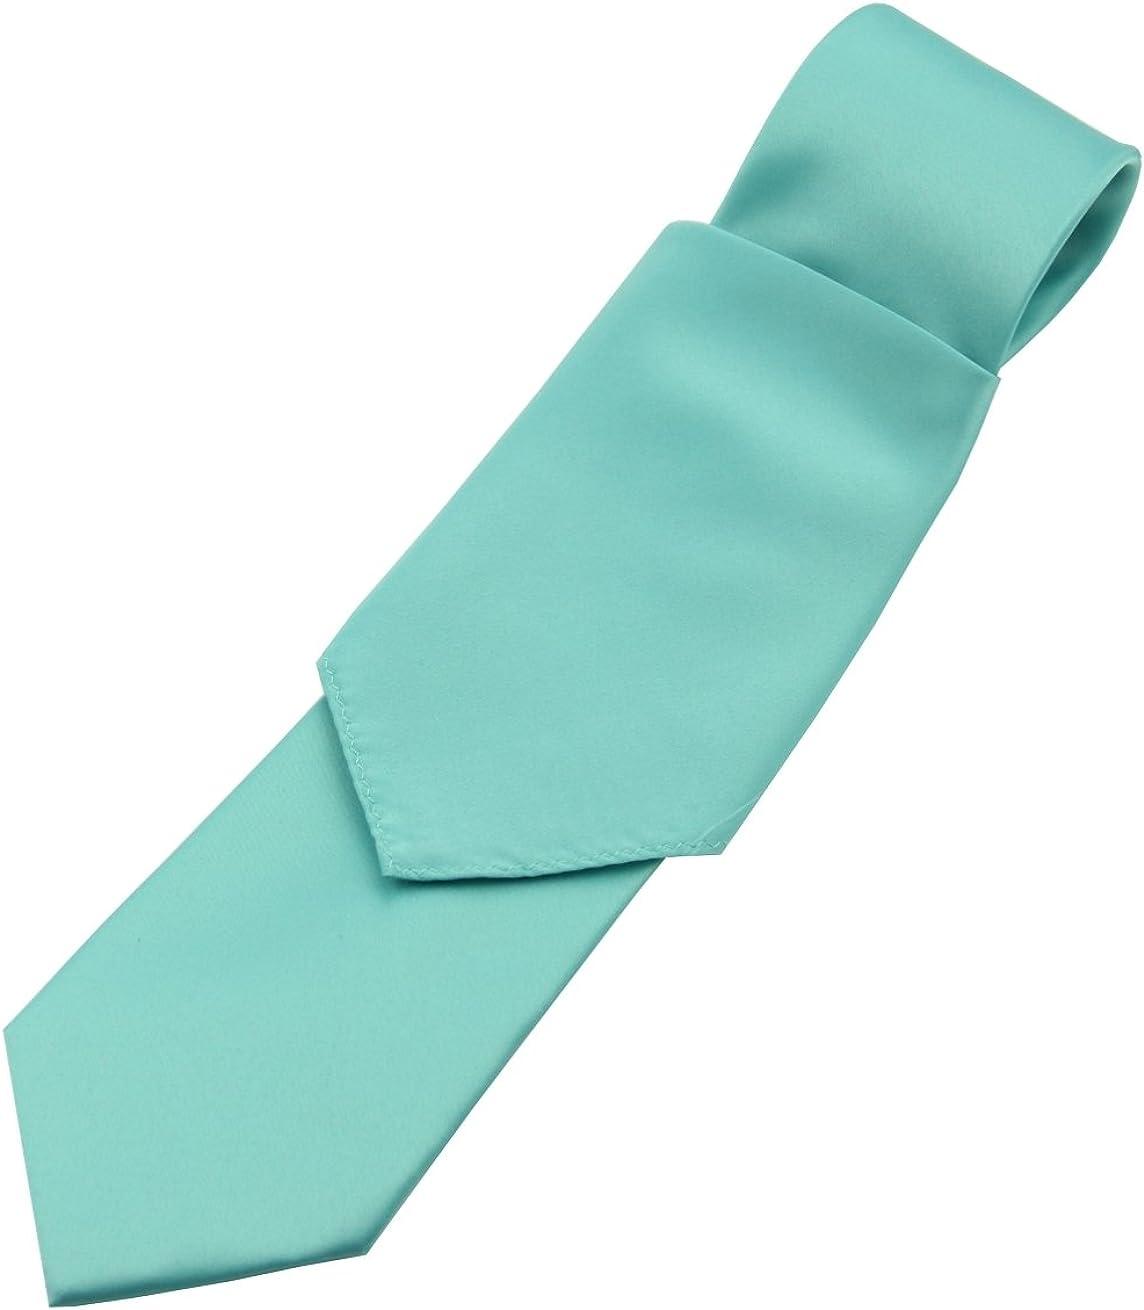 Solid Satin Men's Necktie and Pocket Square set in Teal